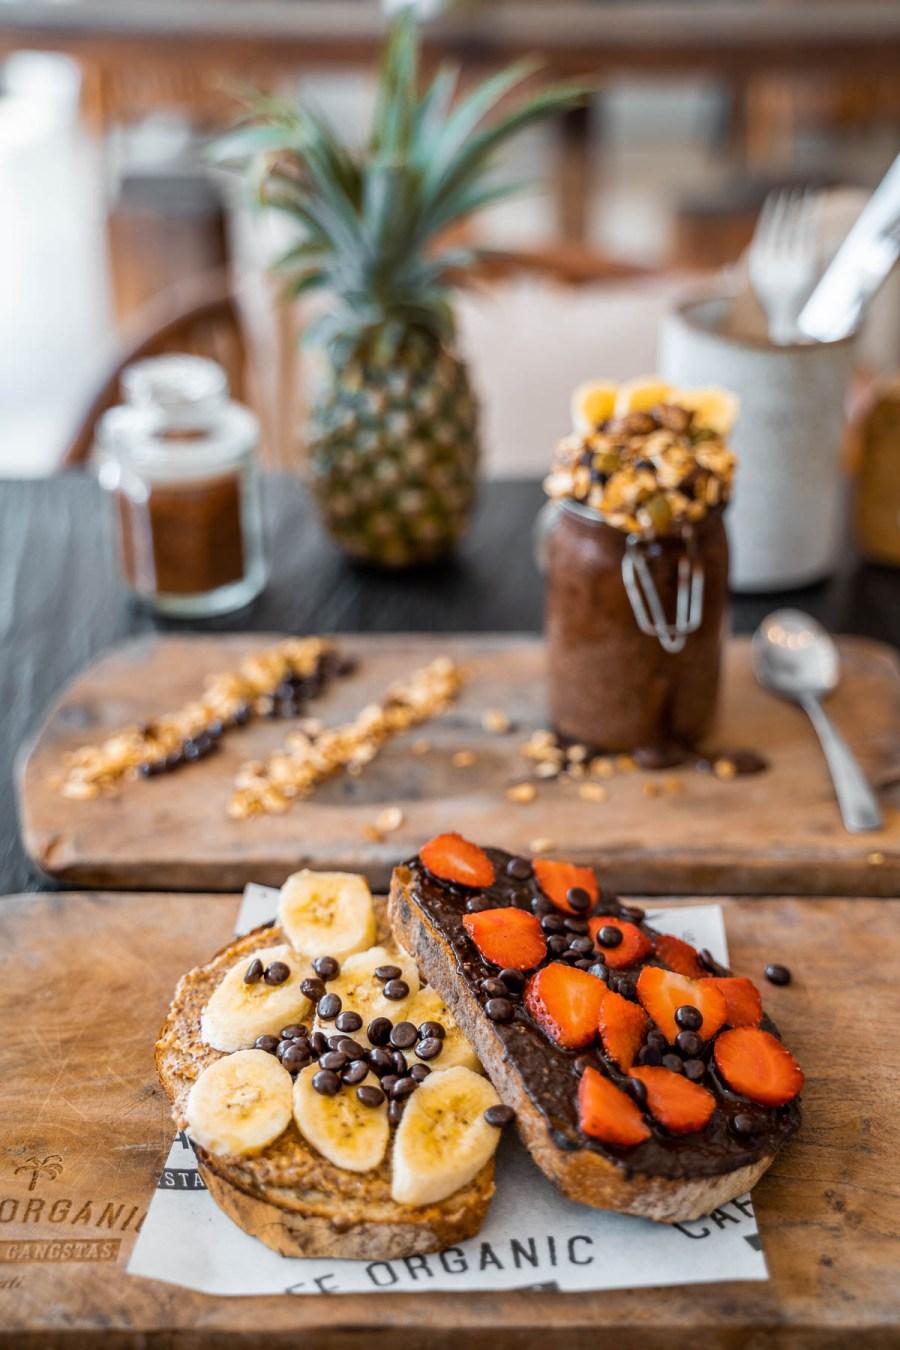 Breakfast with banana and chocolate toast at Cafe Organic in Canggu, Bali